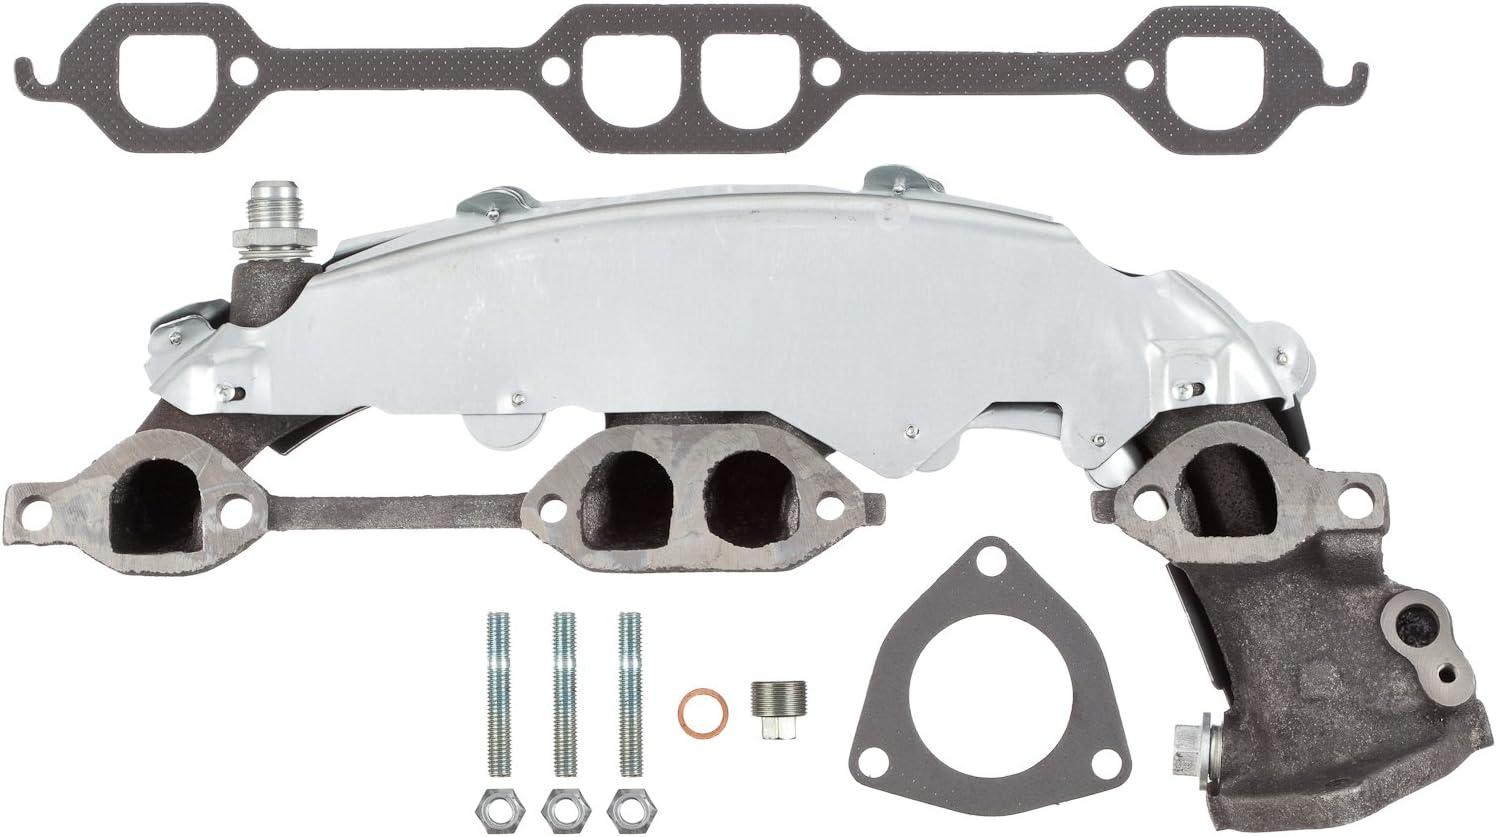 ATP Automotive Graywerks 101085 Exhaust Manifold